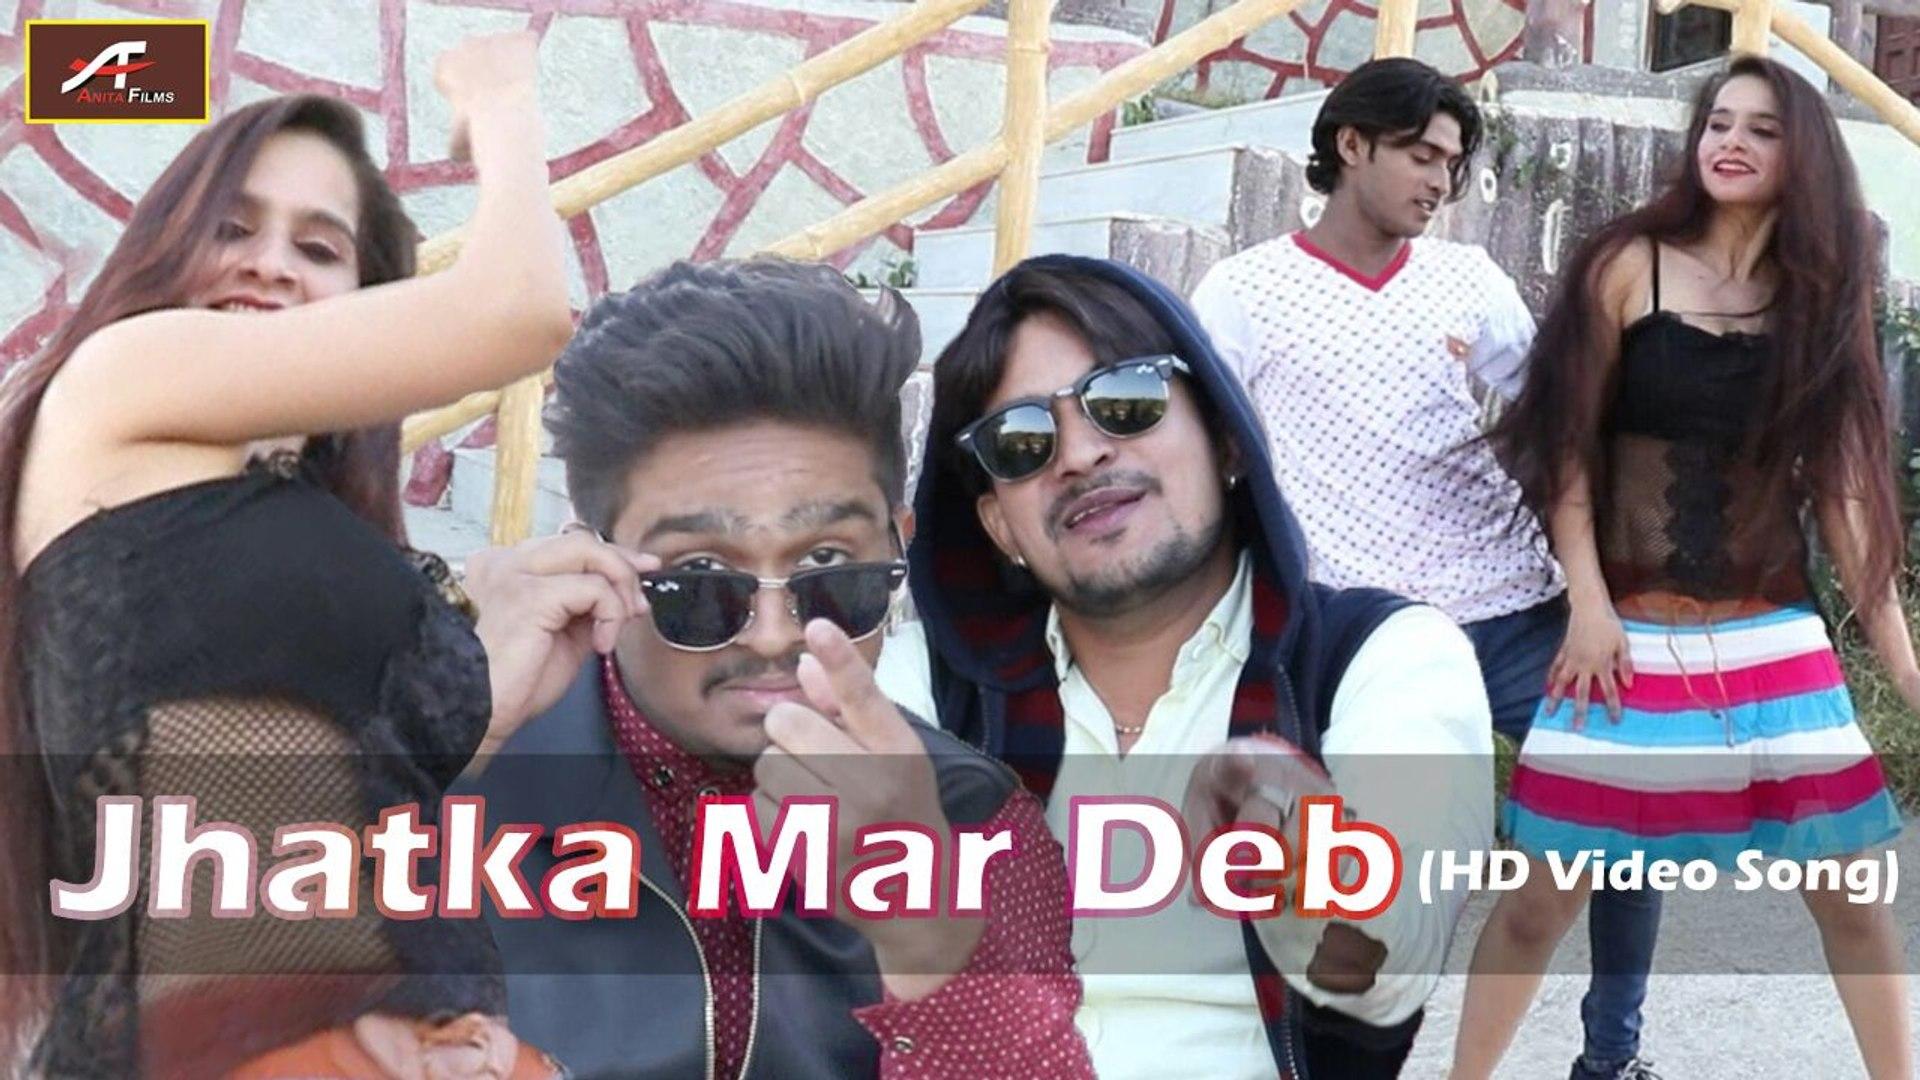 Latest Bhojpuri Rap Song | Jhatka Mar Deb - (FULL HD VIDEO SONG) | Bhojpuri Hot & Sexy songs 201